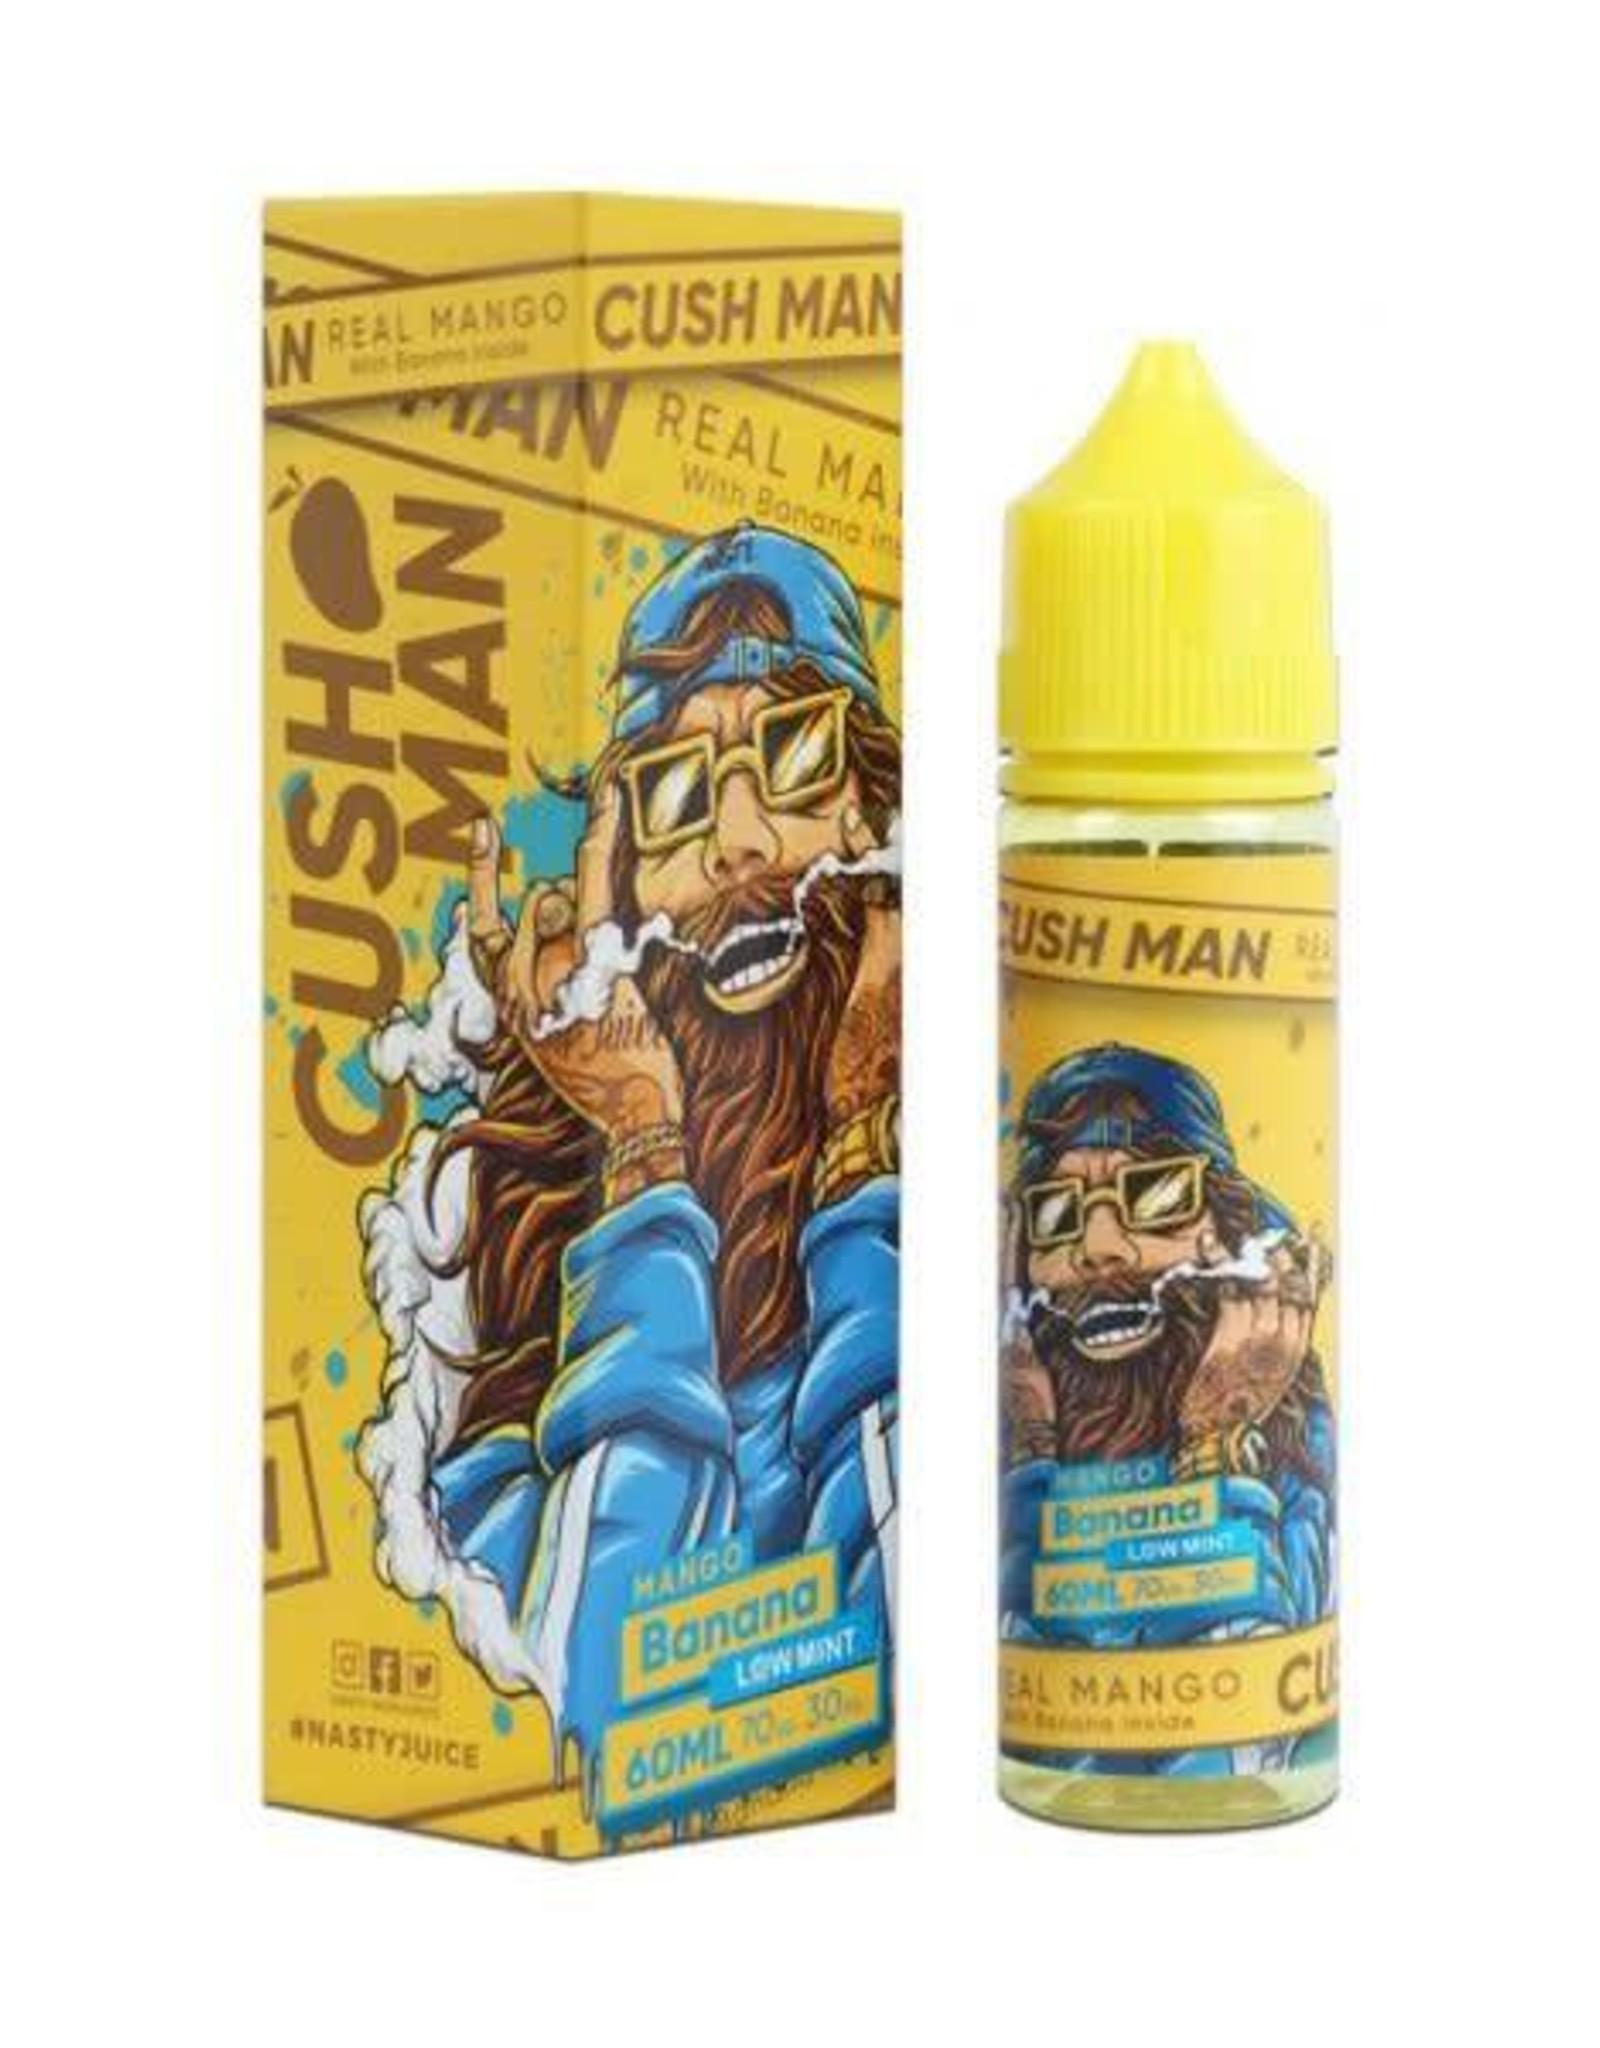 Nasty Juice - Cush Man Mango Banana (Low Mint) (60mL)